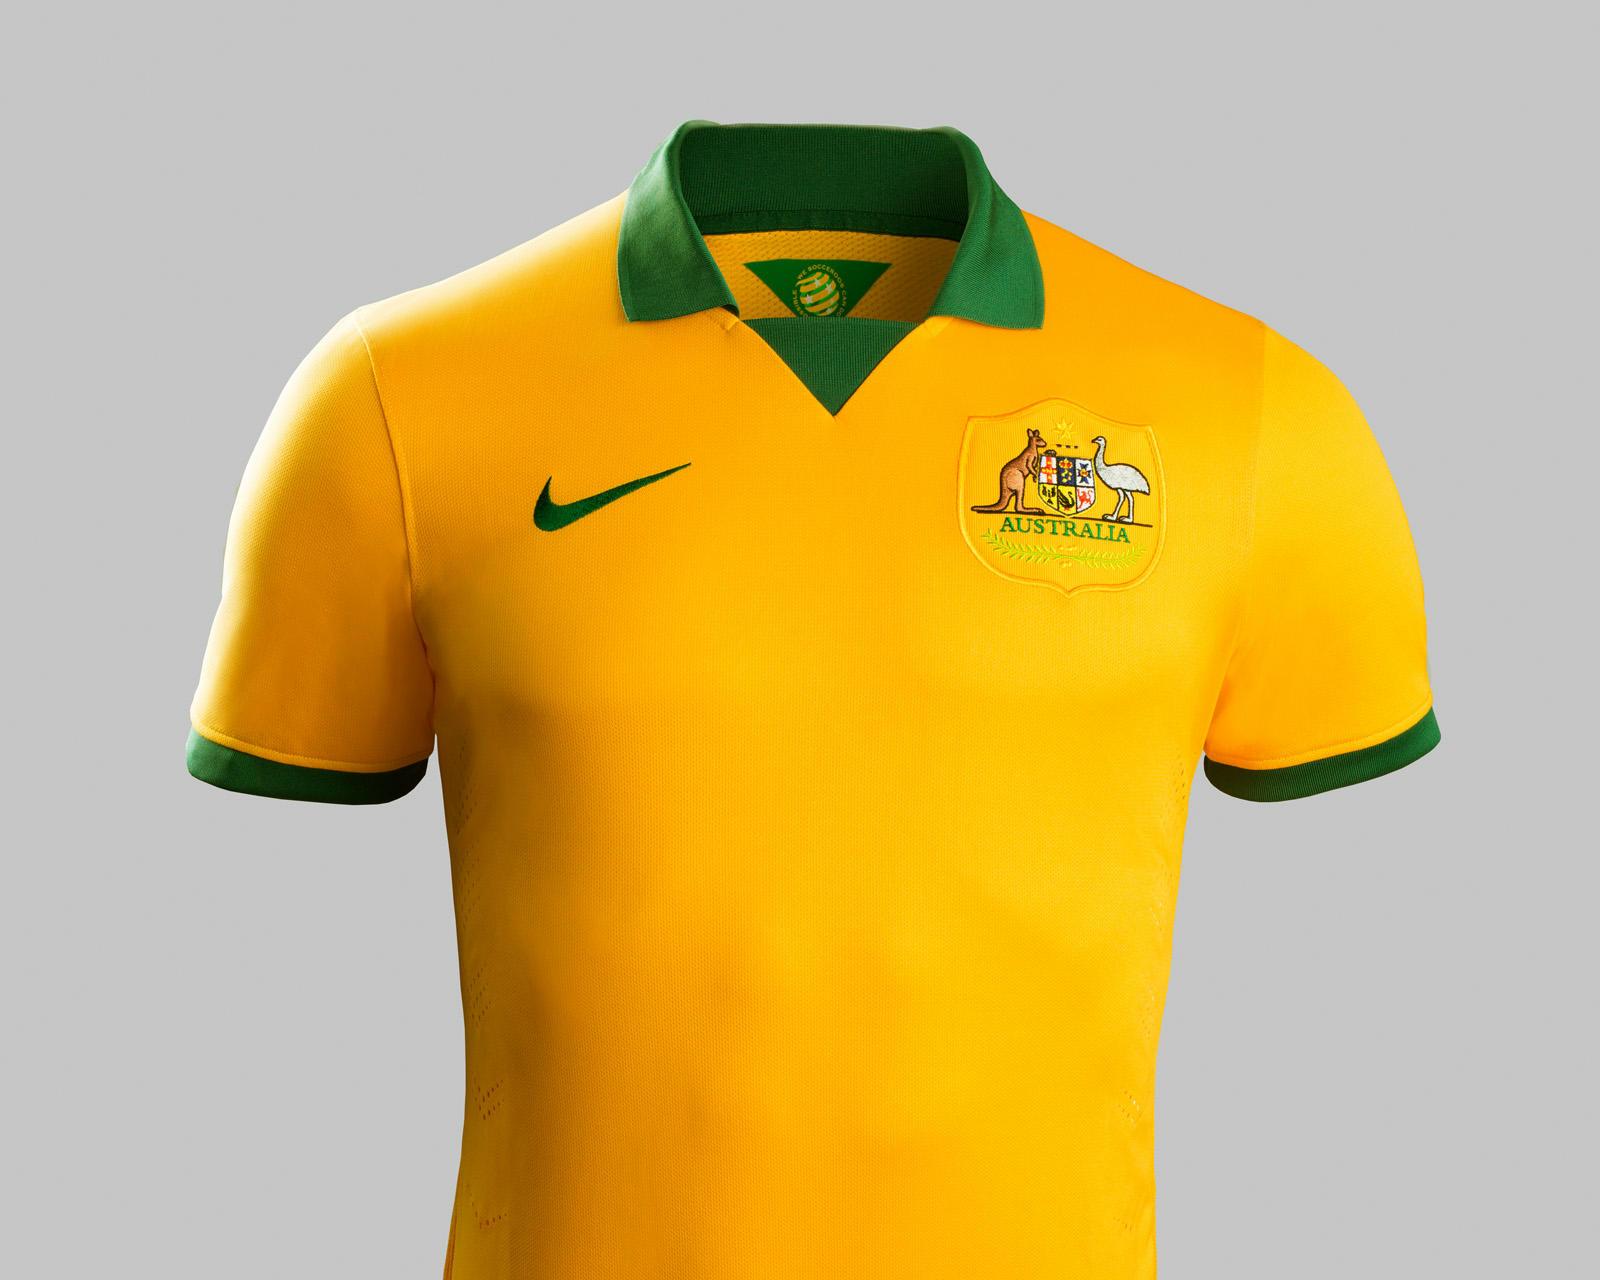 Australia 2014 World Cup Australia 2014 World Cup Home